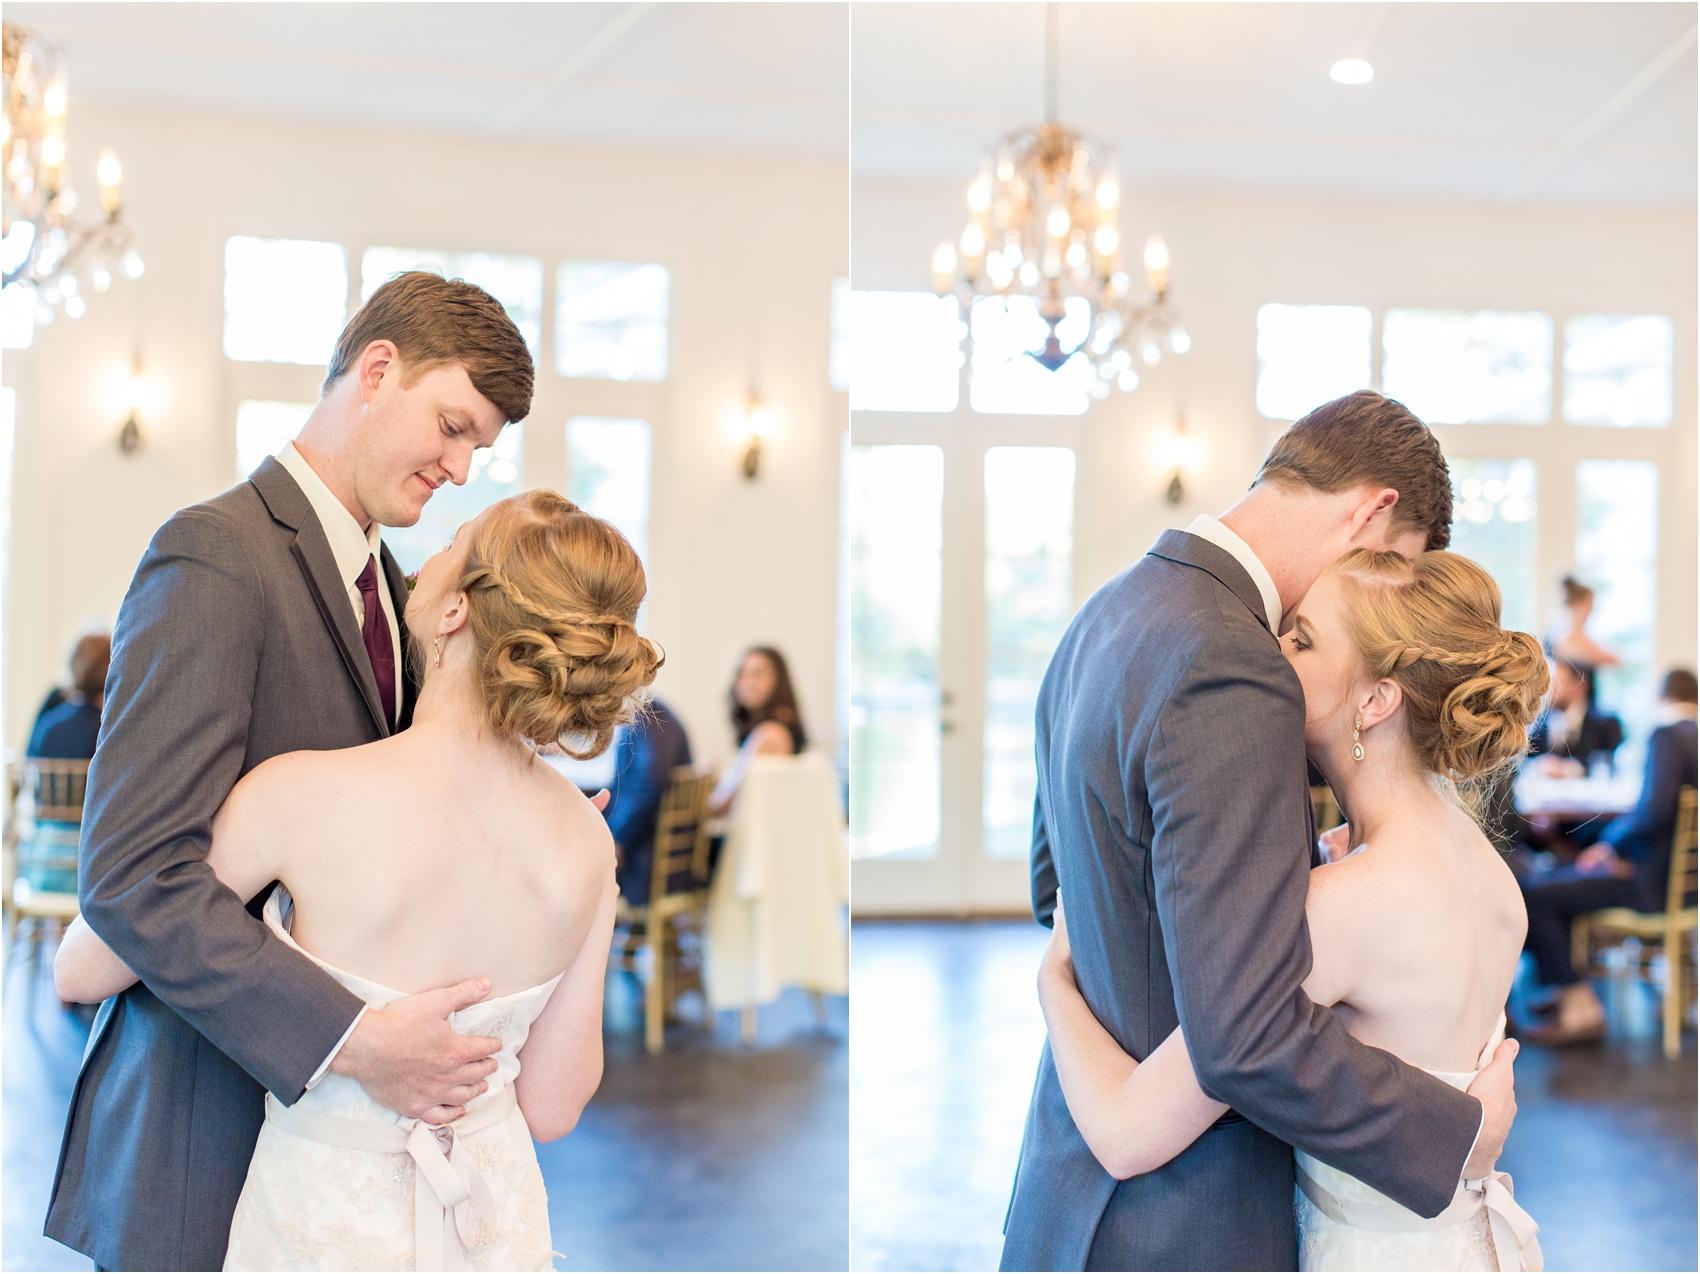 Savannah Eve Photography- Perkins Wedding- Blog-33.jpg